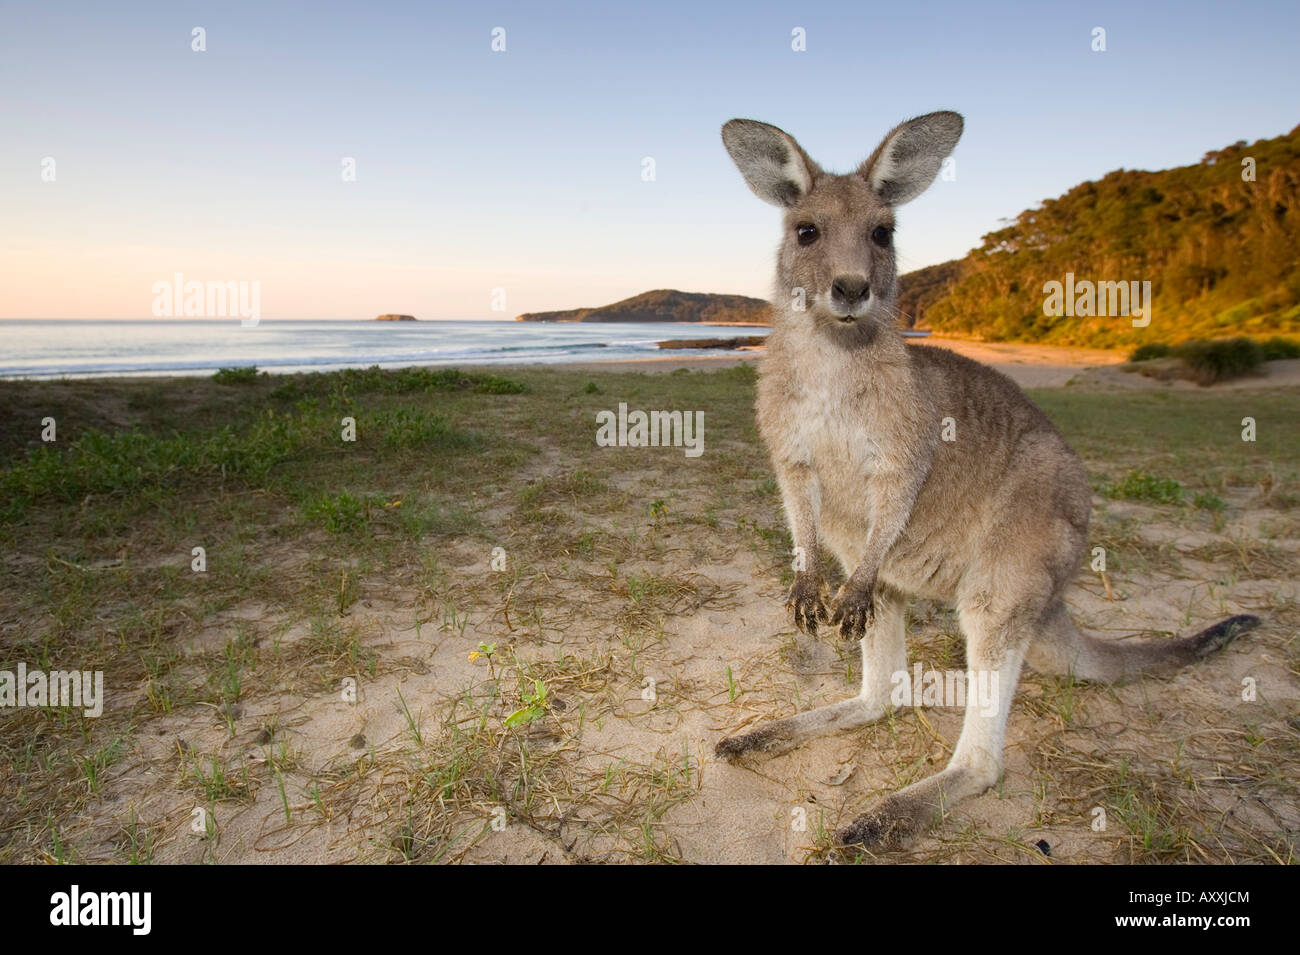 Eastern Grey Kangaroo, (Macropus giganteus), Pebbly Beach, Marramarang N.P., New South Wales, Australia - Stock Image